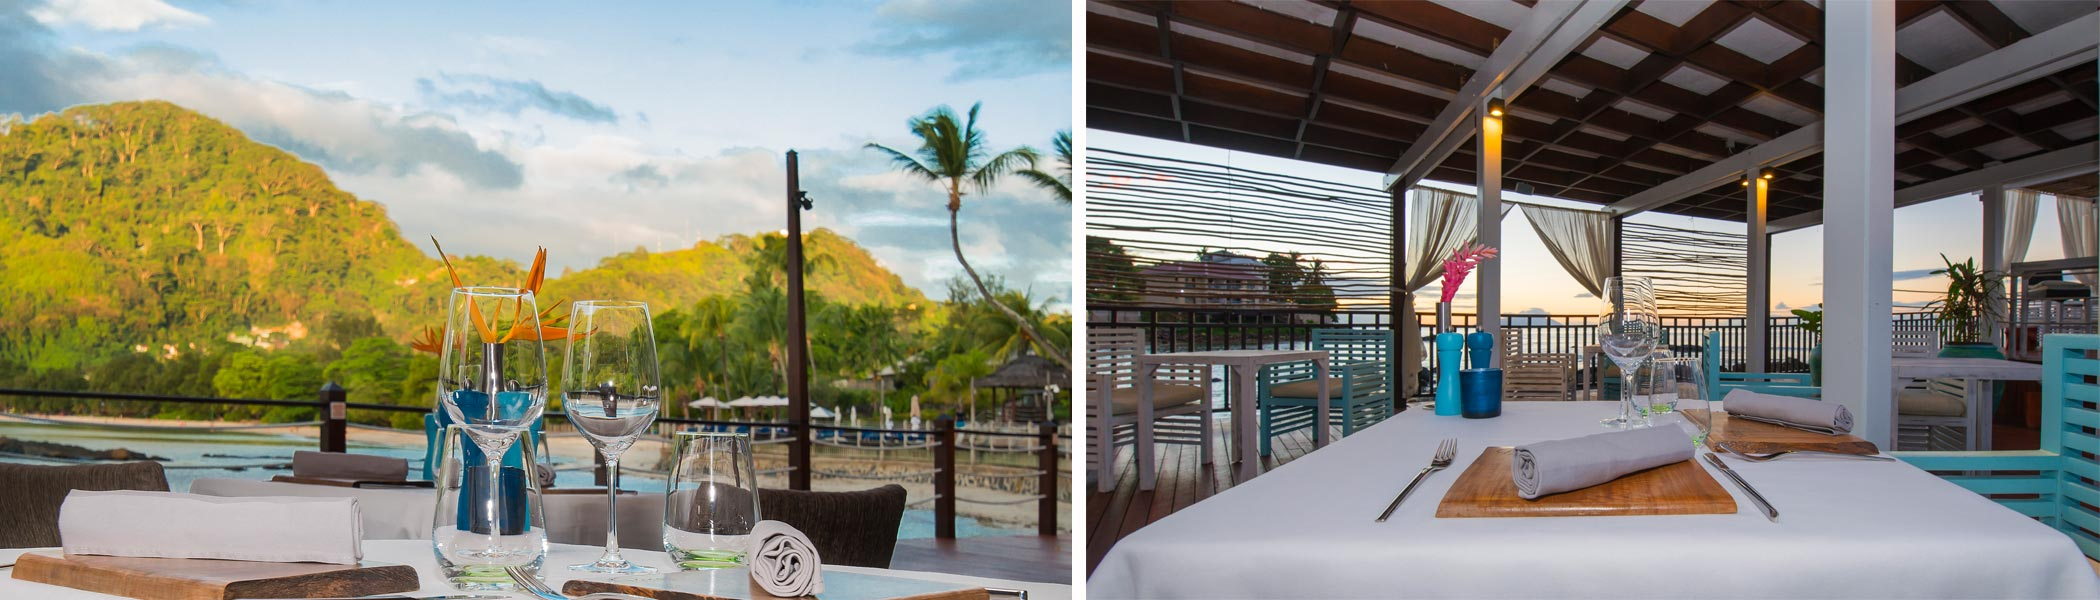 paris-seychelles-restaurant-le-meridien-fishermans-cove, Bars and restaurants in Seychelles Islands